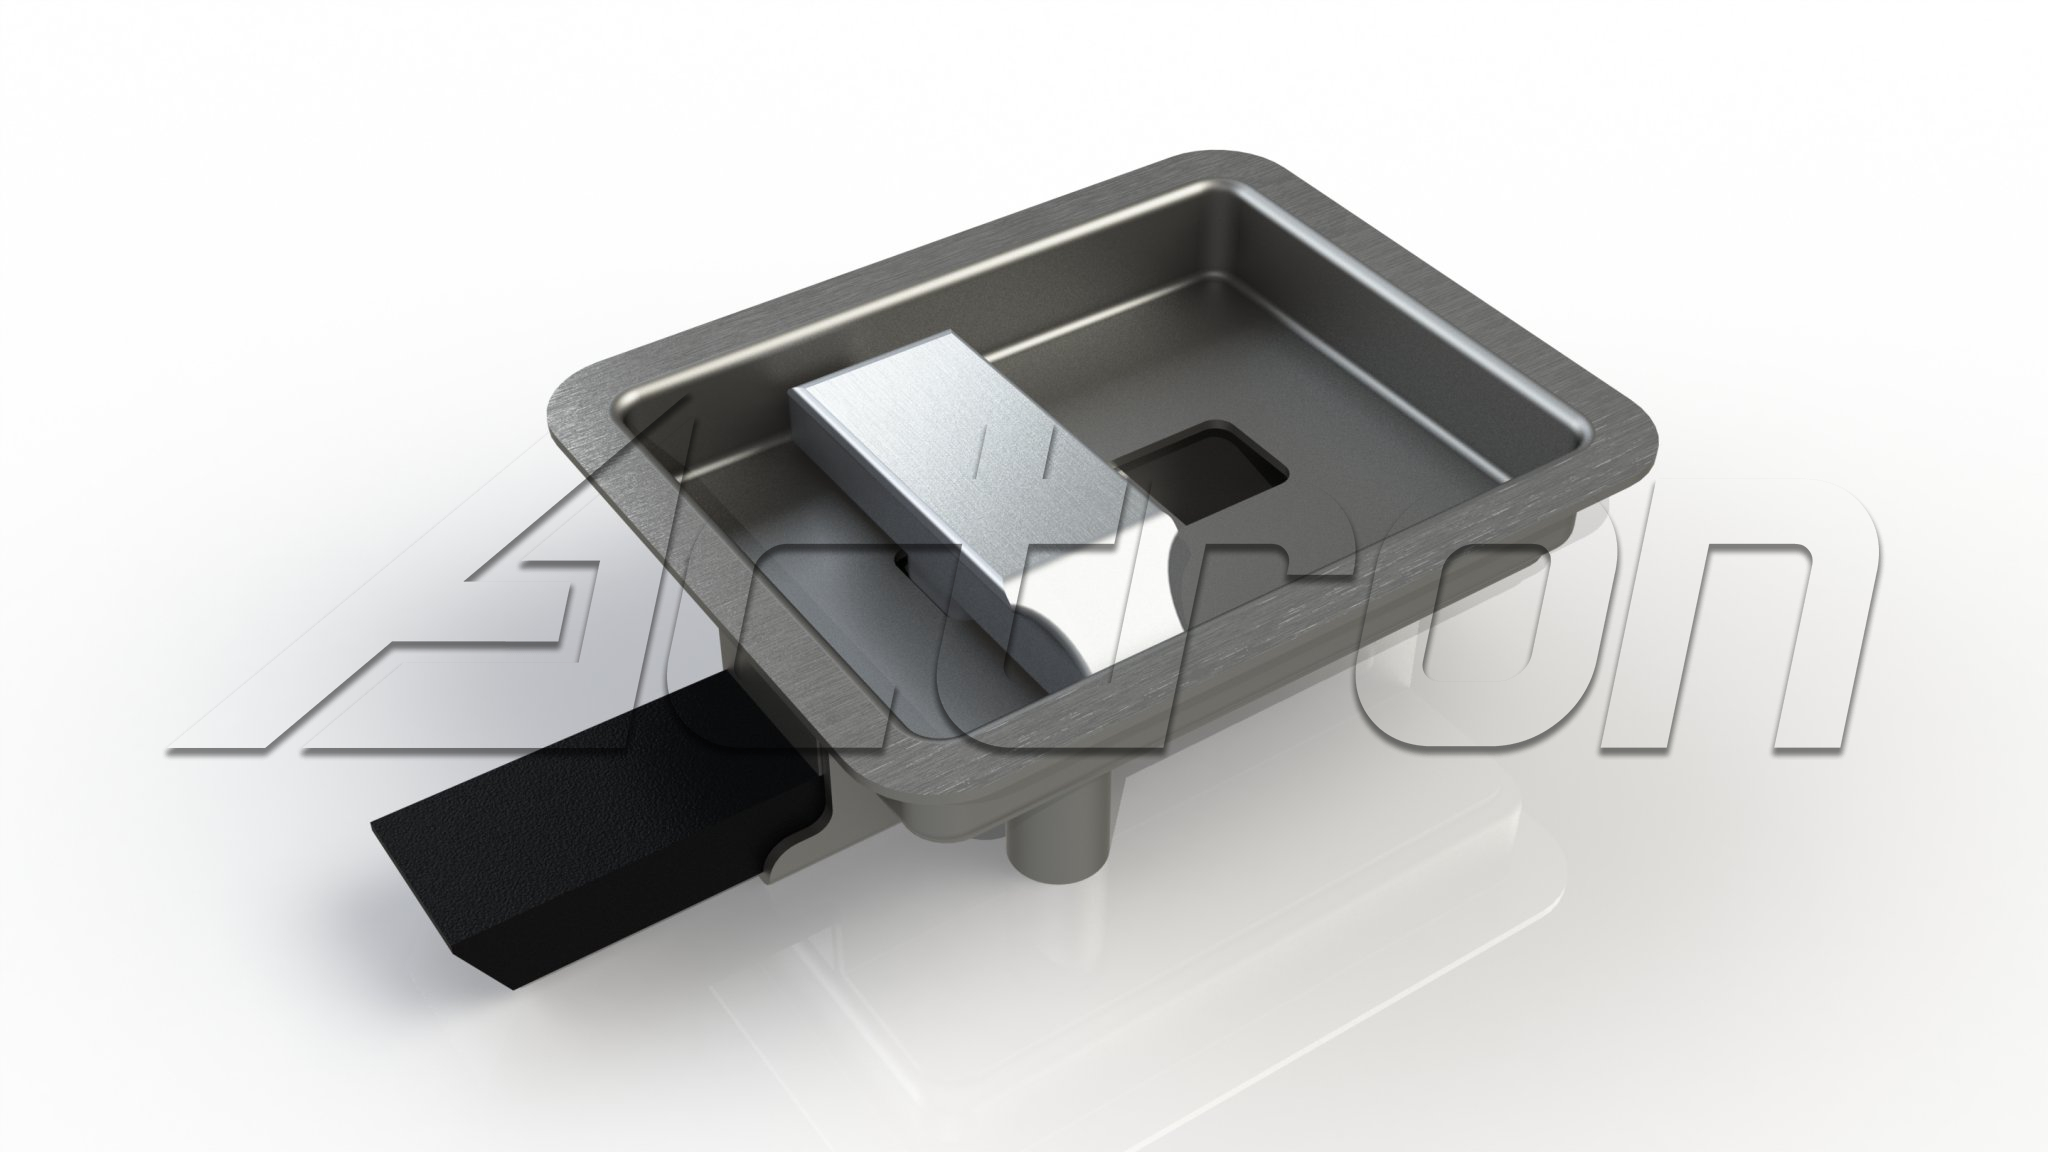 latch-assy-8211-sliding-4560-a27100.jpg